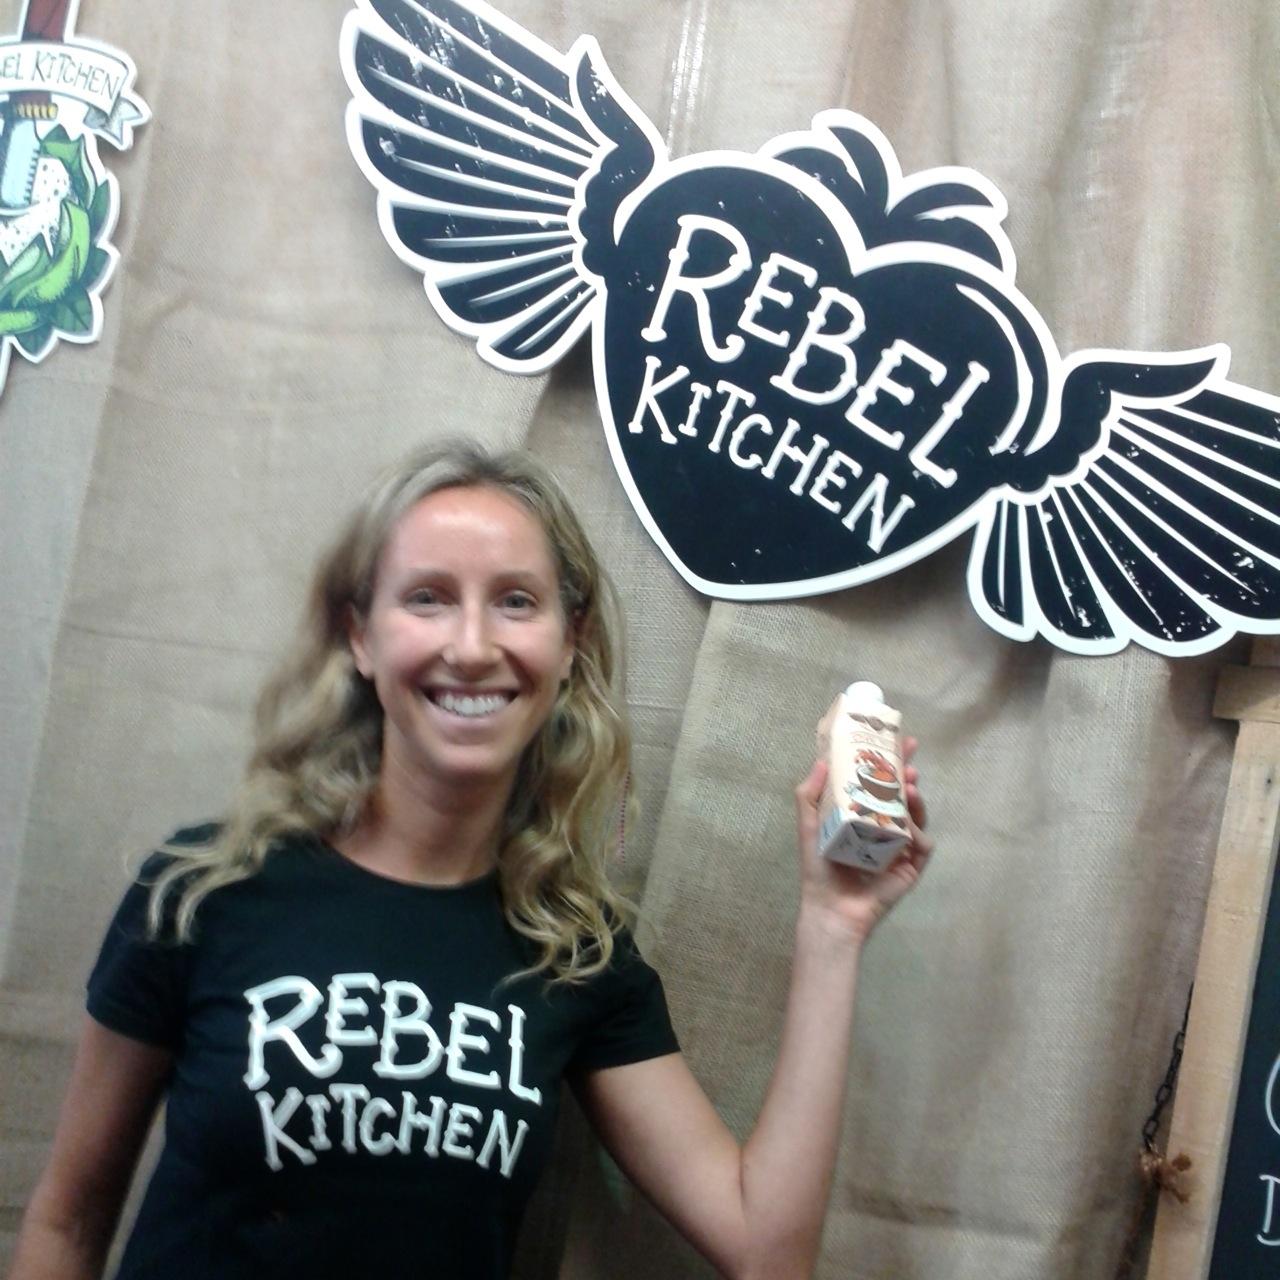 http://i1.wp.com/fatgayvegan.com/wp-content/uploads/2014/09/rebel-kitchen.jpg?fit=1280%2C1280